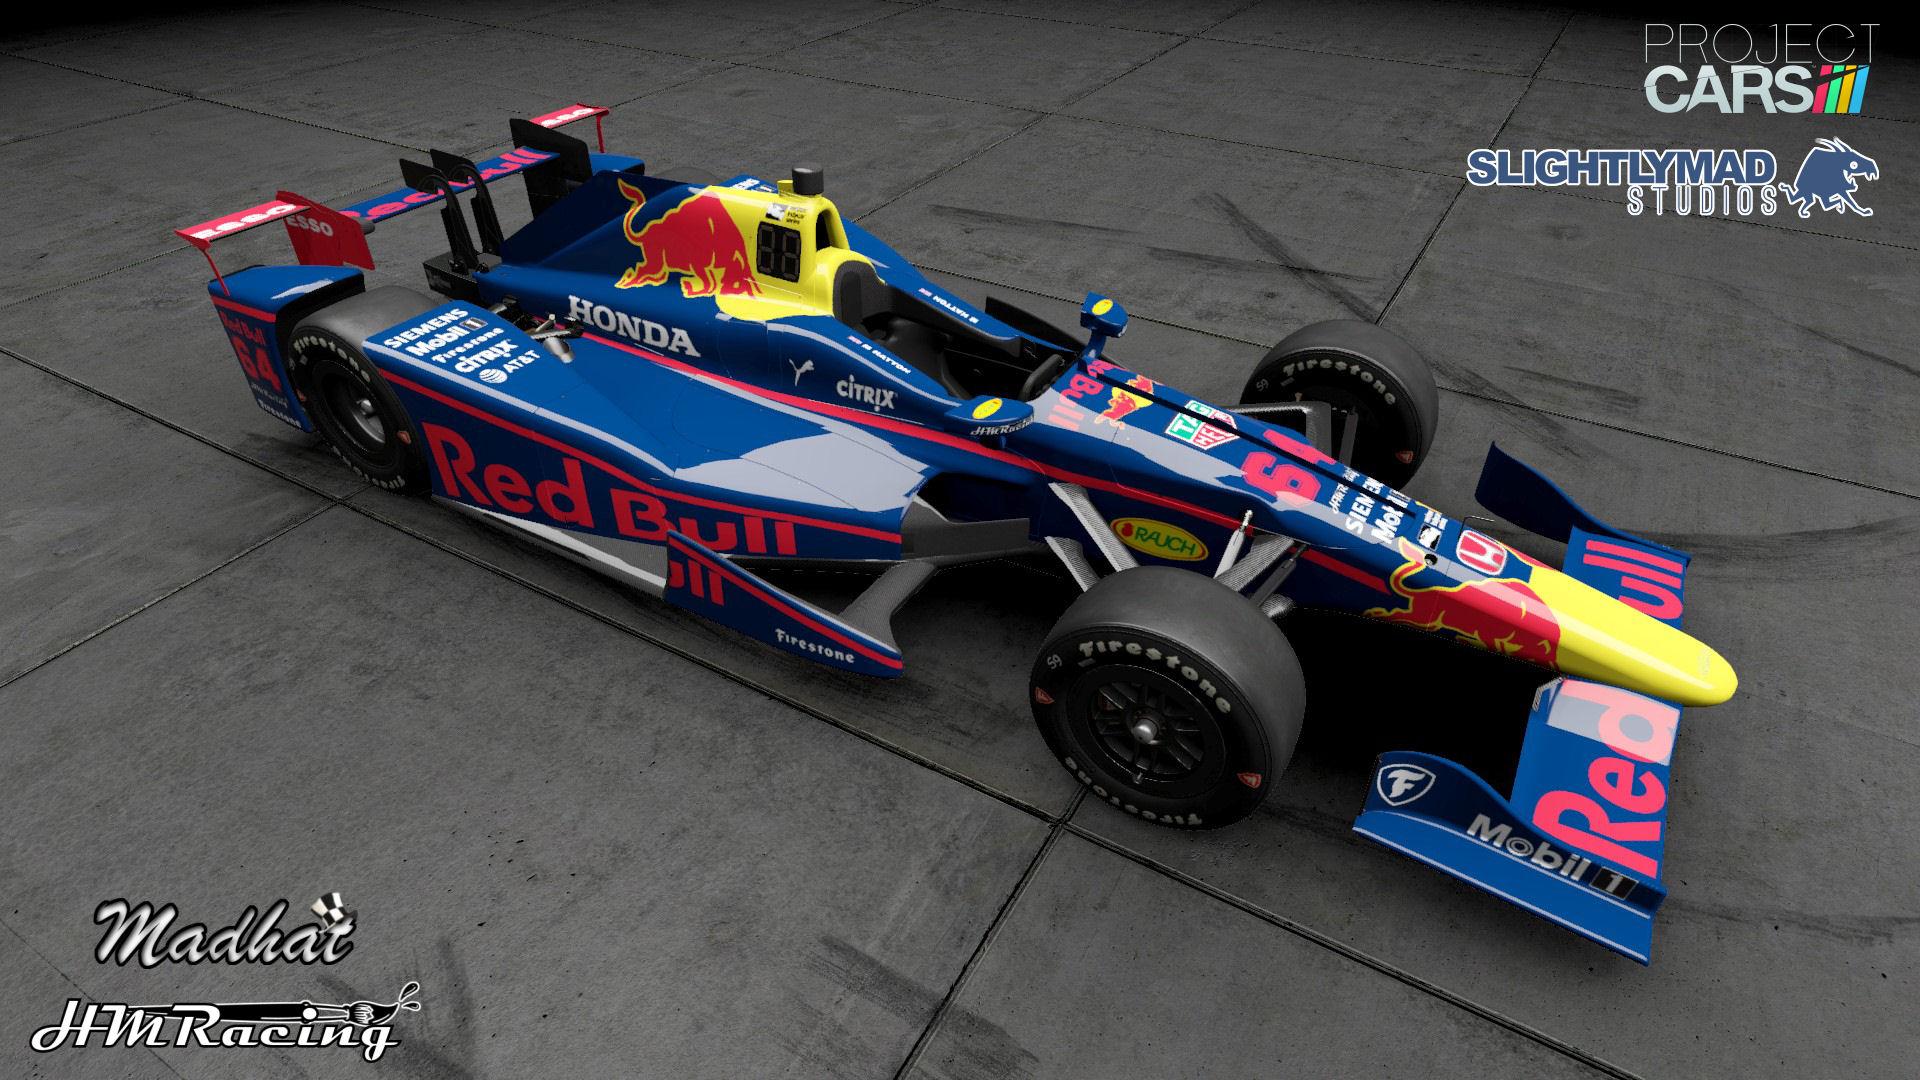 Red Bull dallara dw12 Honda oval 01.jpg